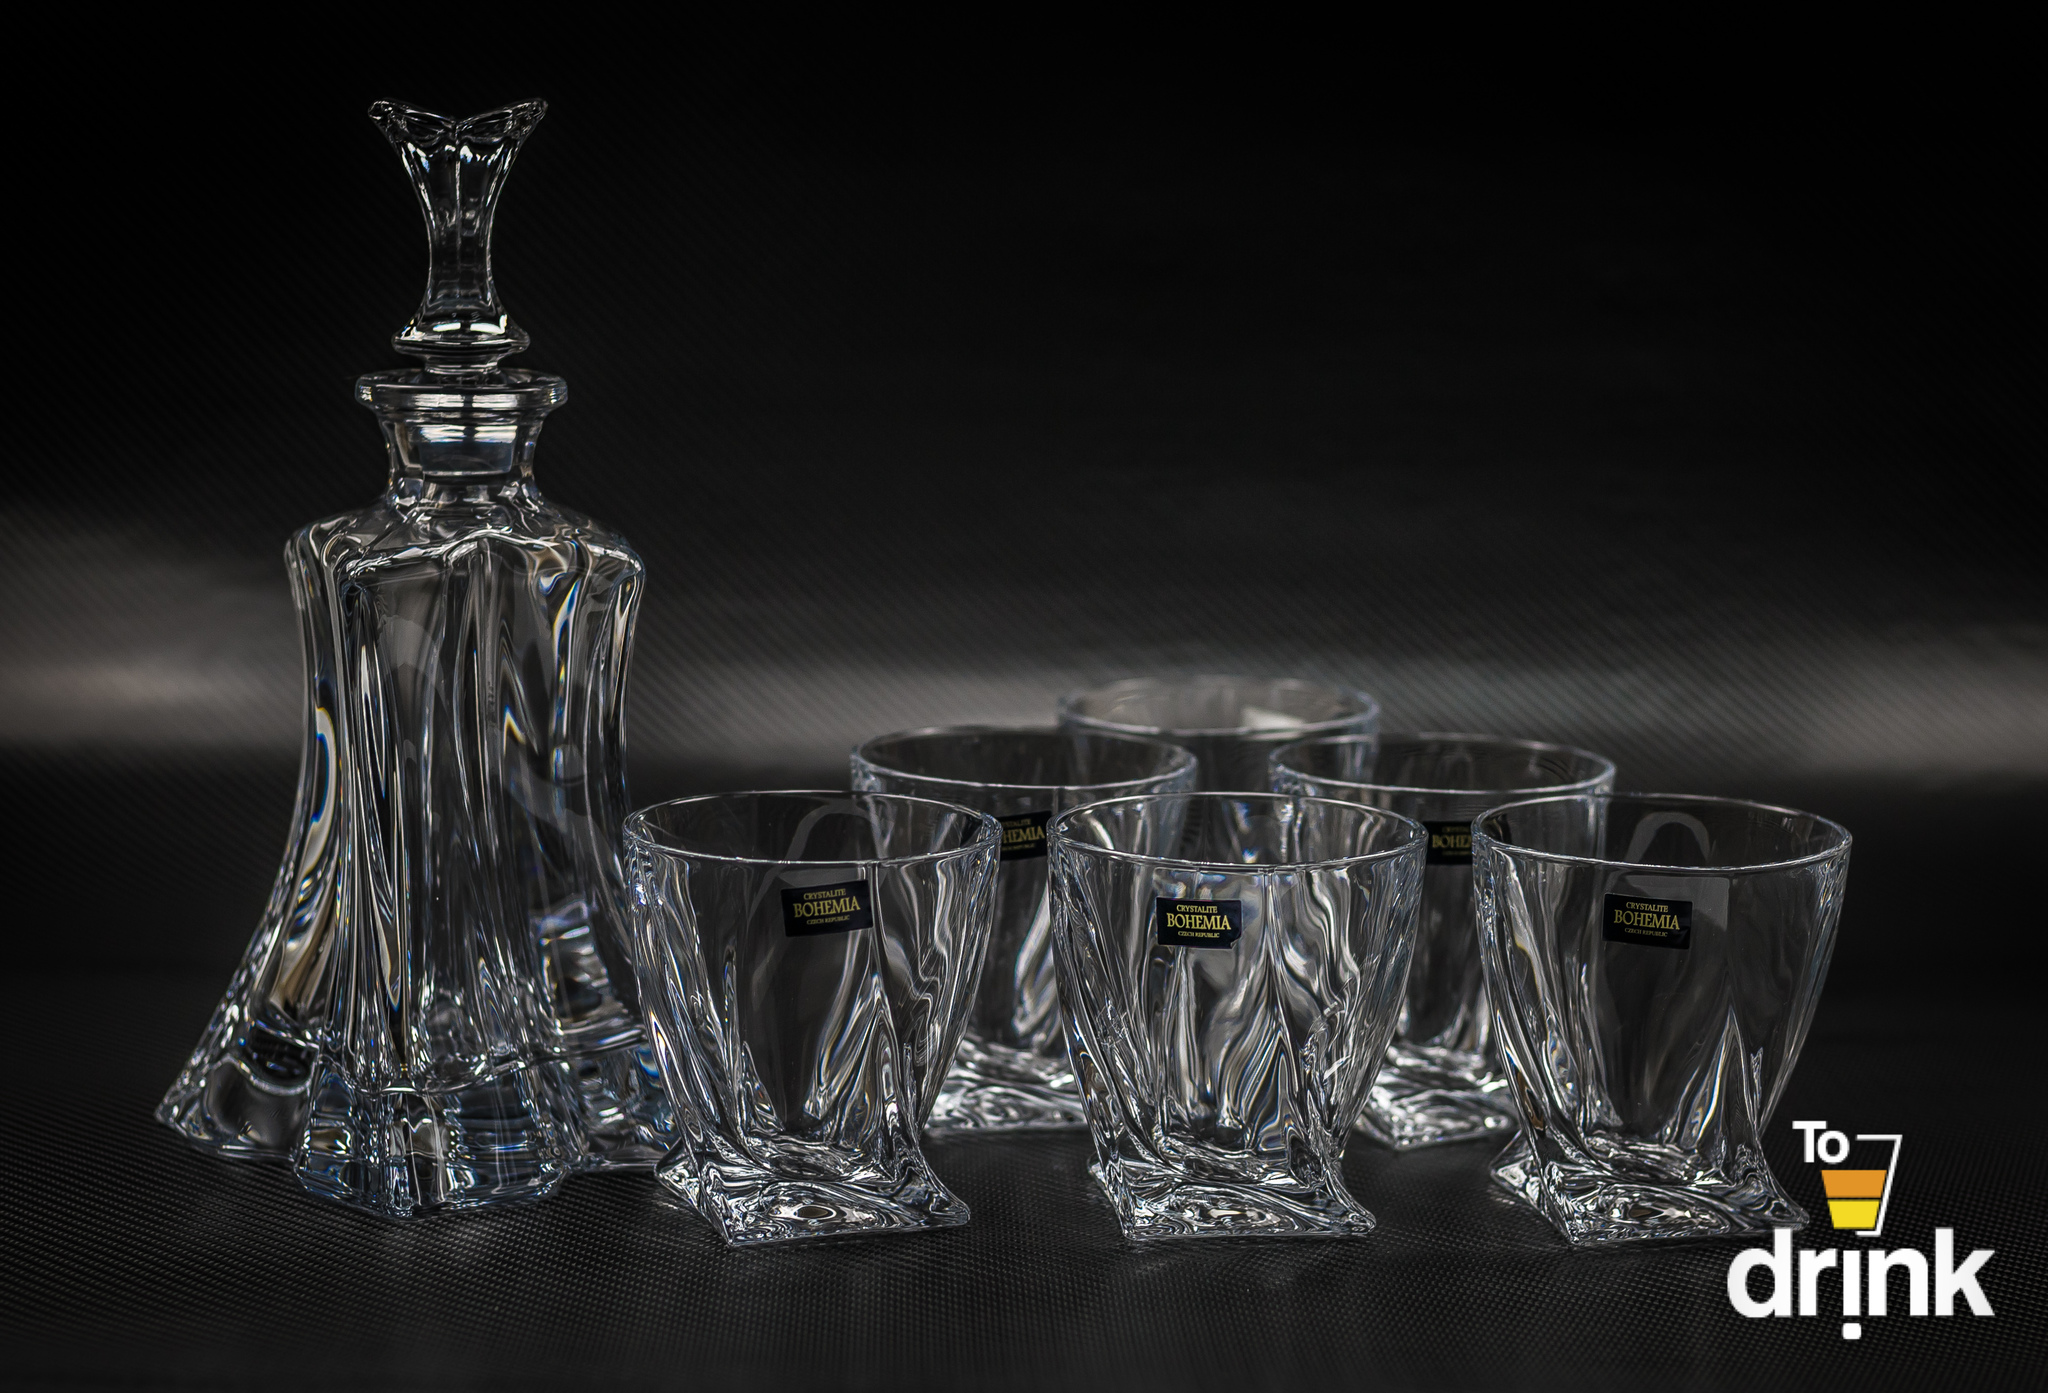 Набор для виски FLORALE, 1 штоф и 6 бокалов гамма набор из 6 бокалов для виски регина